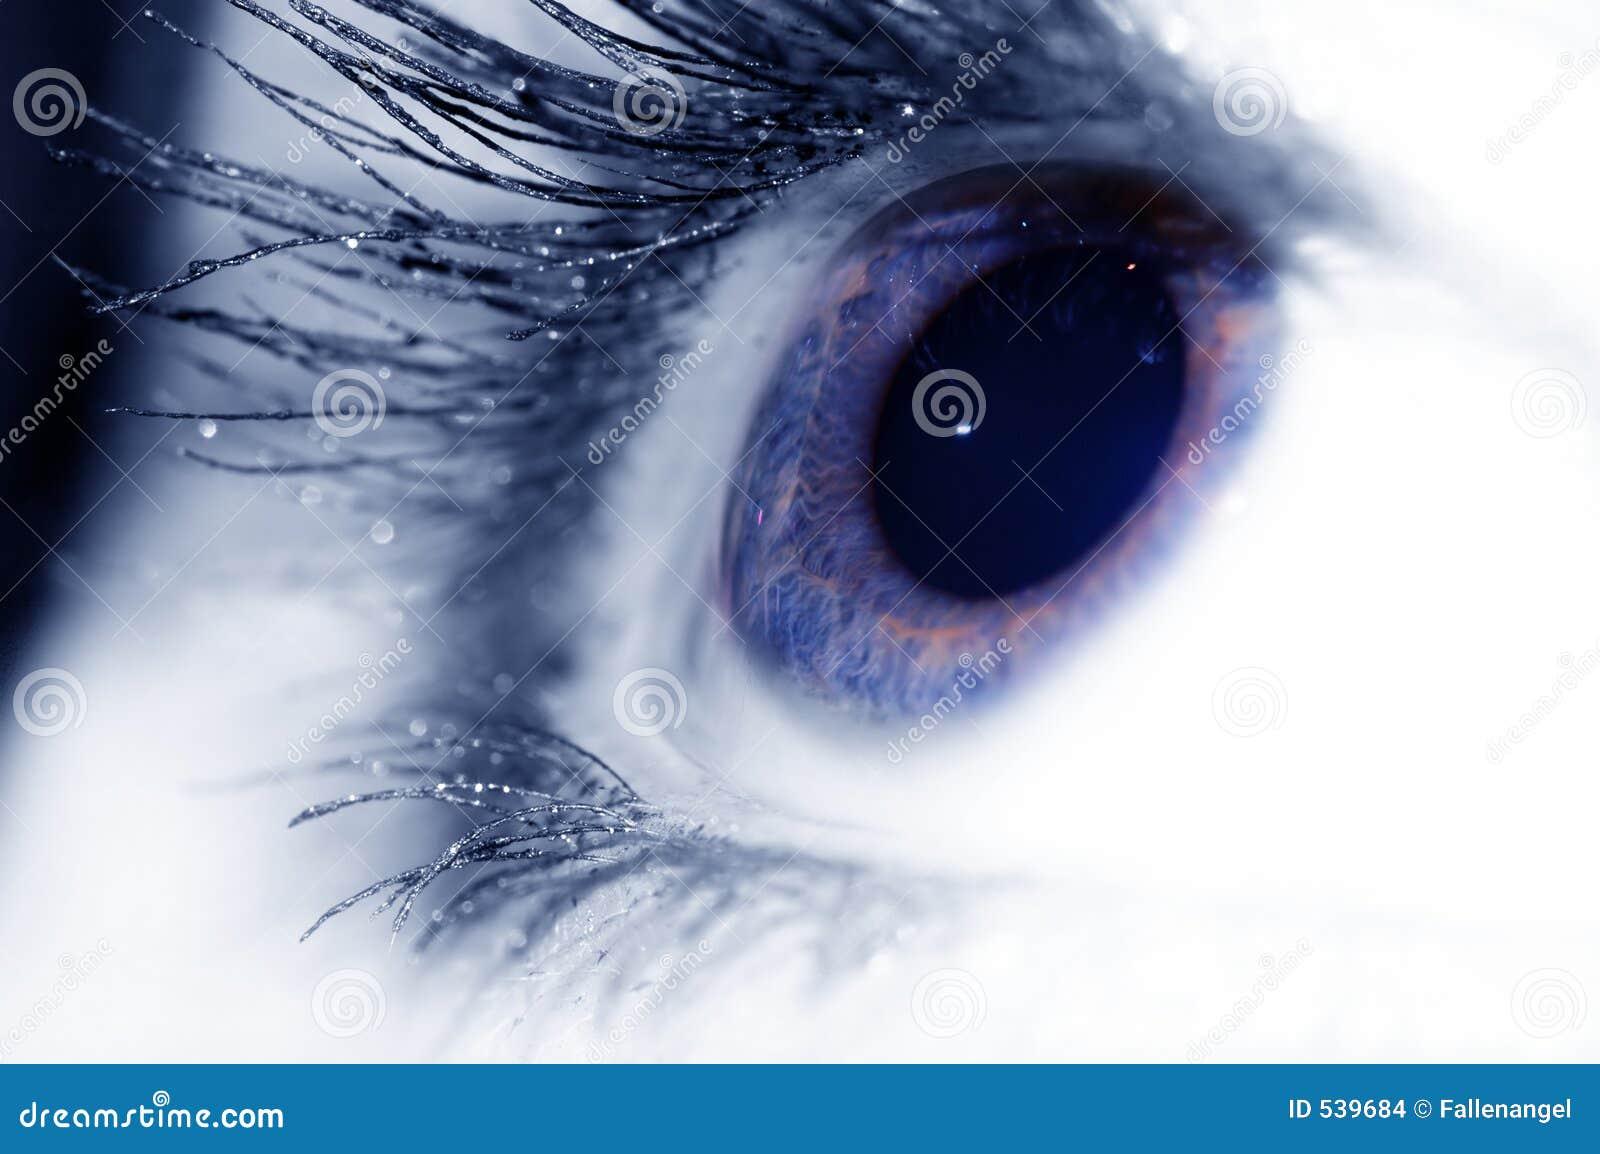 Download 蓝眼睛 库存照片. 图片 包括有 人力, 强光, 眼珠, 扫视, 沟通, 魅力, 构成, 眼皮, 眼睛, 光学 - 539684